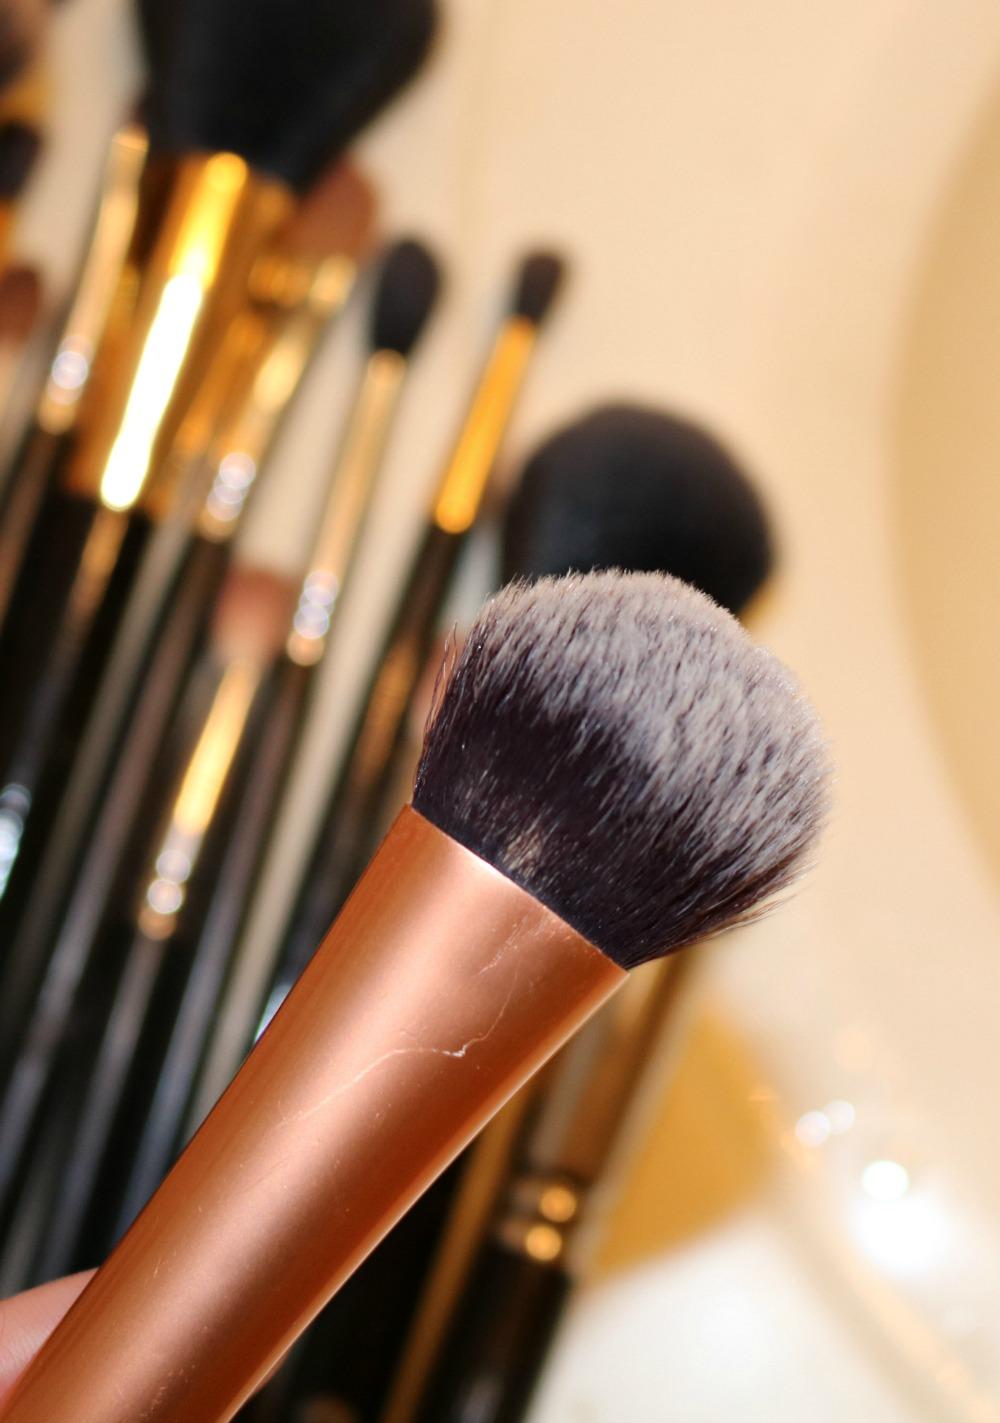 Best Makeup Brush Cleanser? Live Clean Coconut Milk Shampoo I DreaminLace.com #Makeup #CrueltyFree #BeautyTips